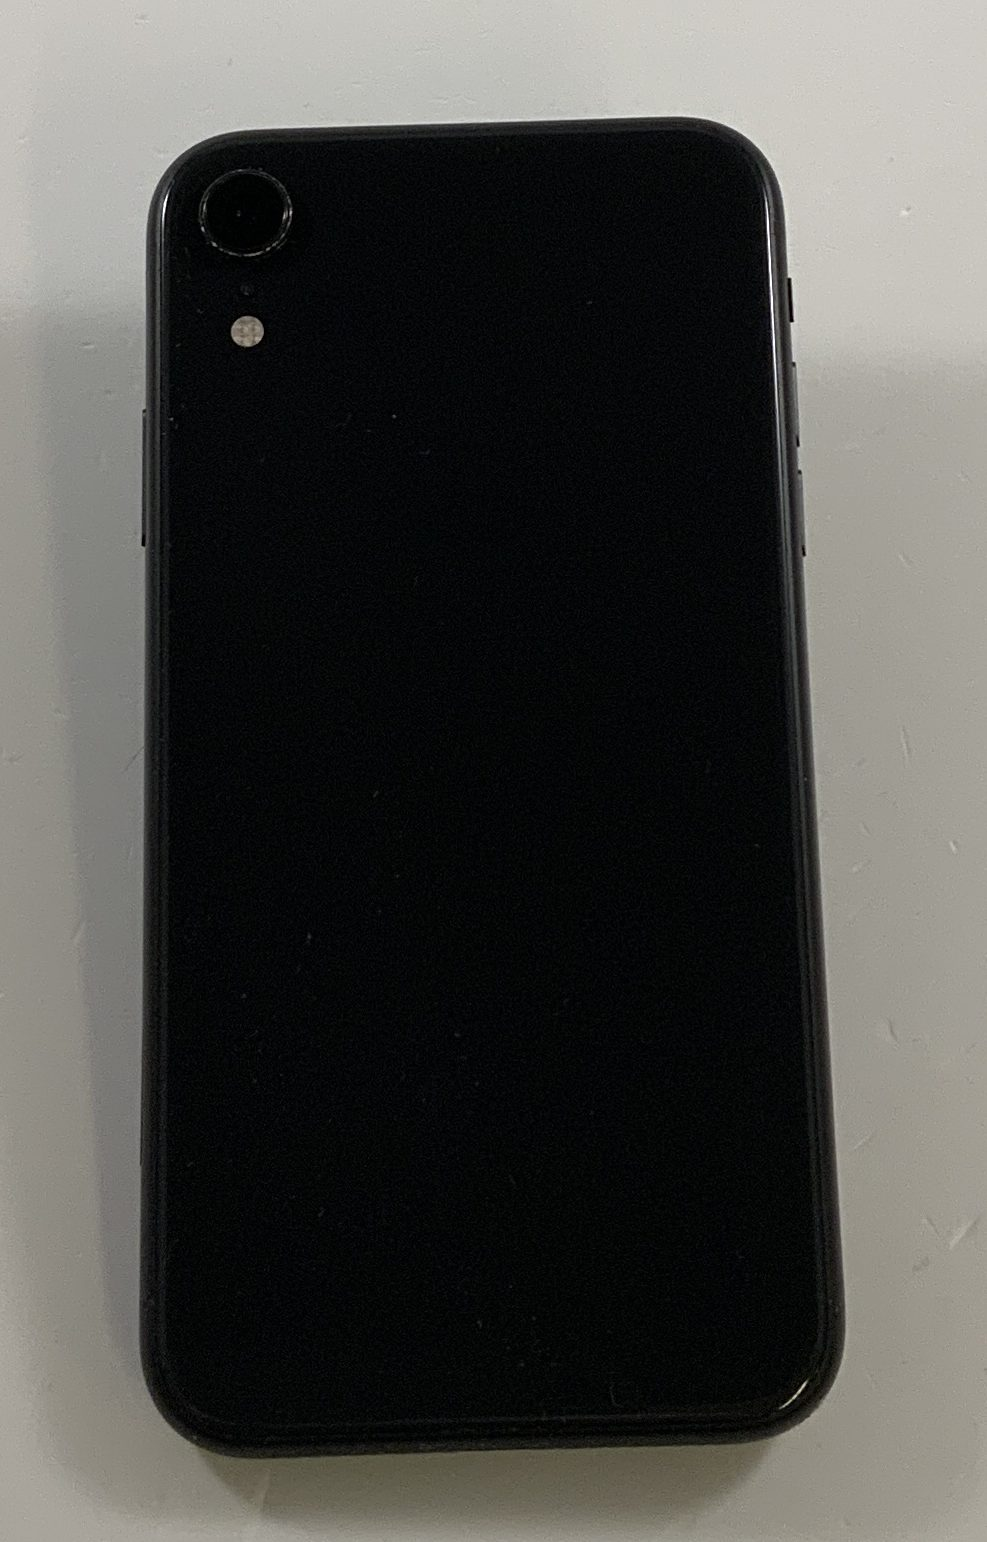 iPhone XR 64GB, 64GB, Black, image 2